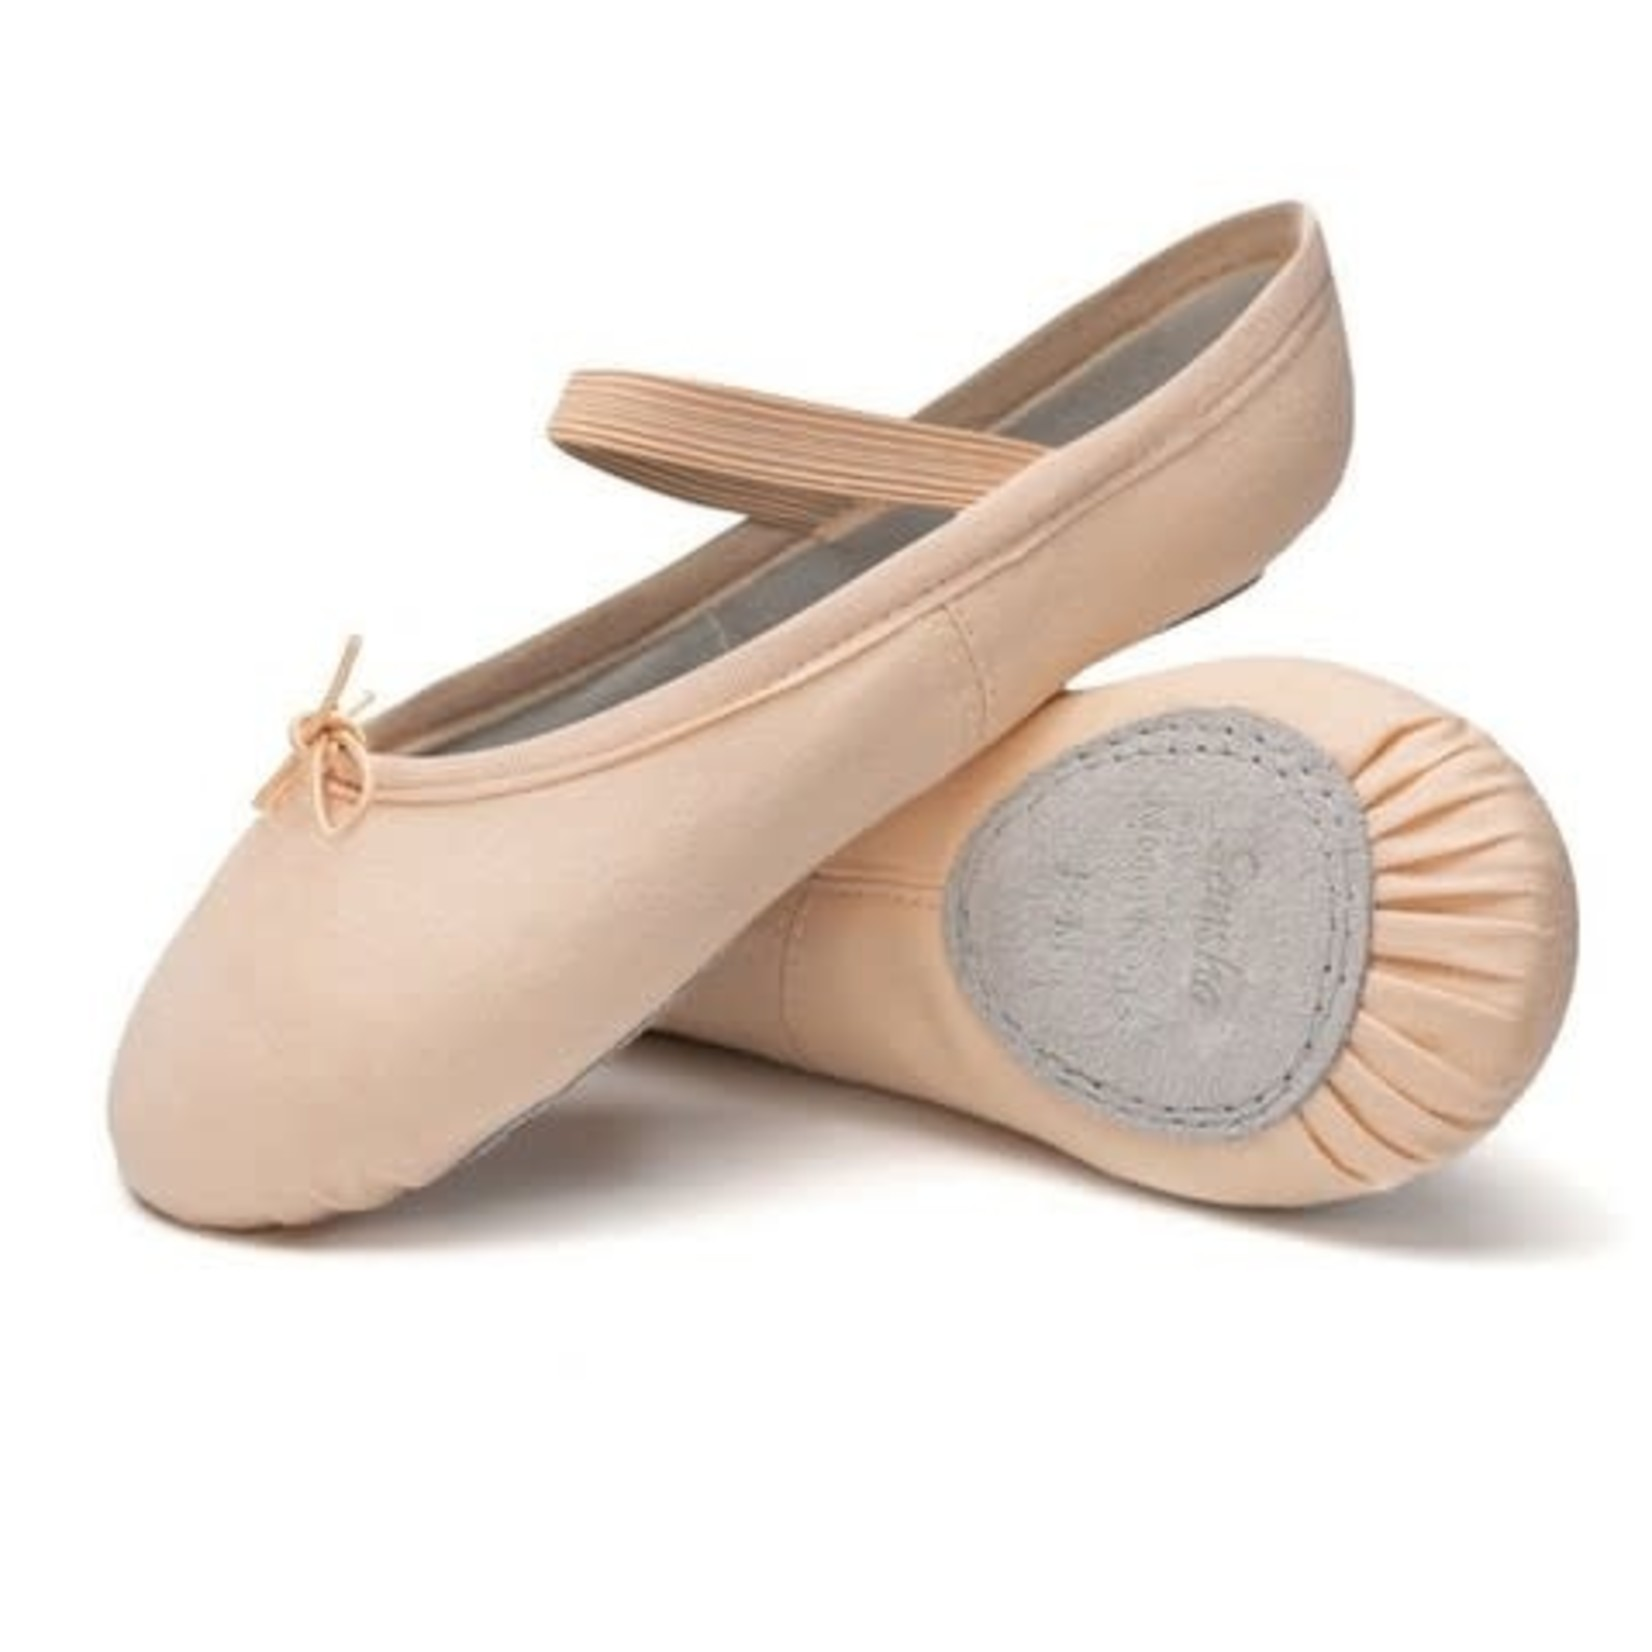 Sansha Sansha 15C Star-Split Child Canvas Ballet Shoe